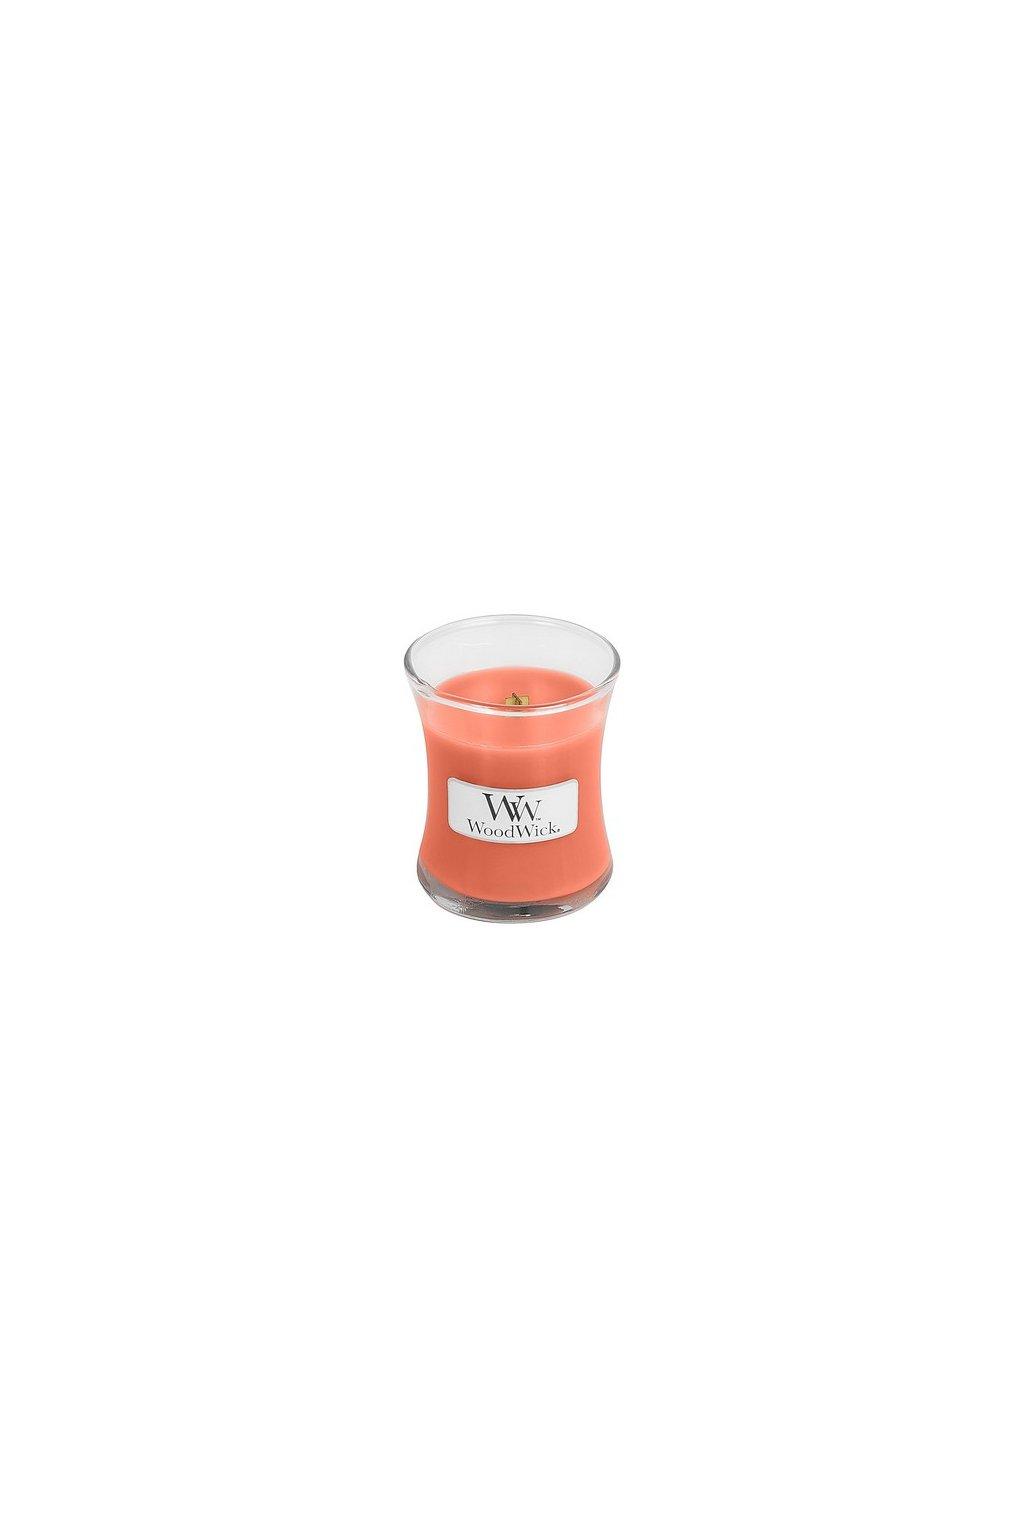 WoodWick Tamarind & Stonefruit svíčka malá 85g